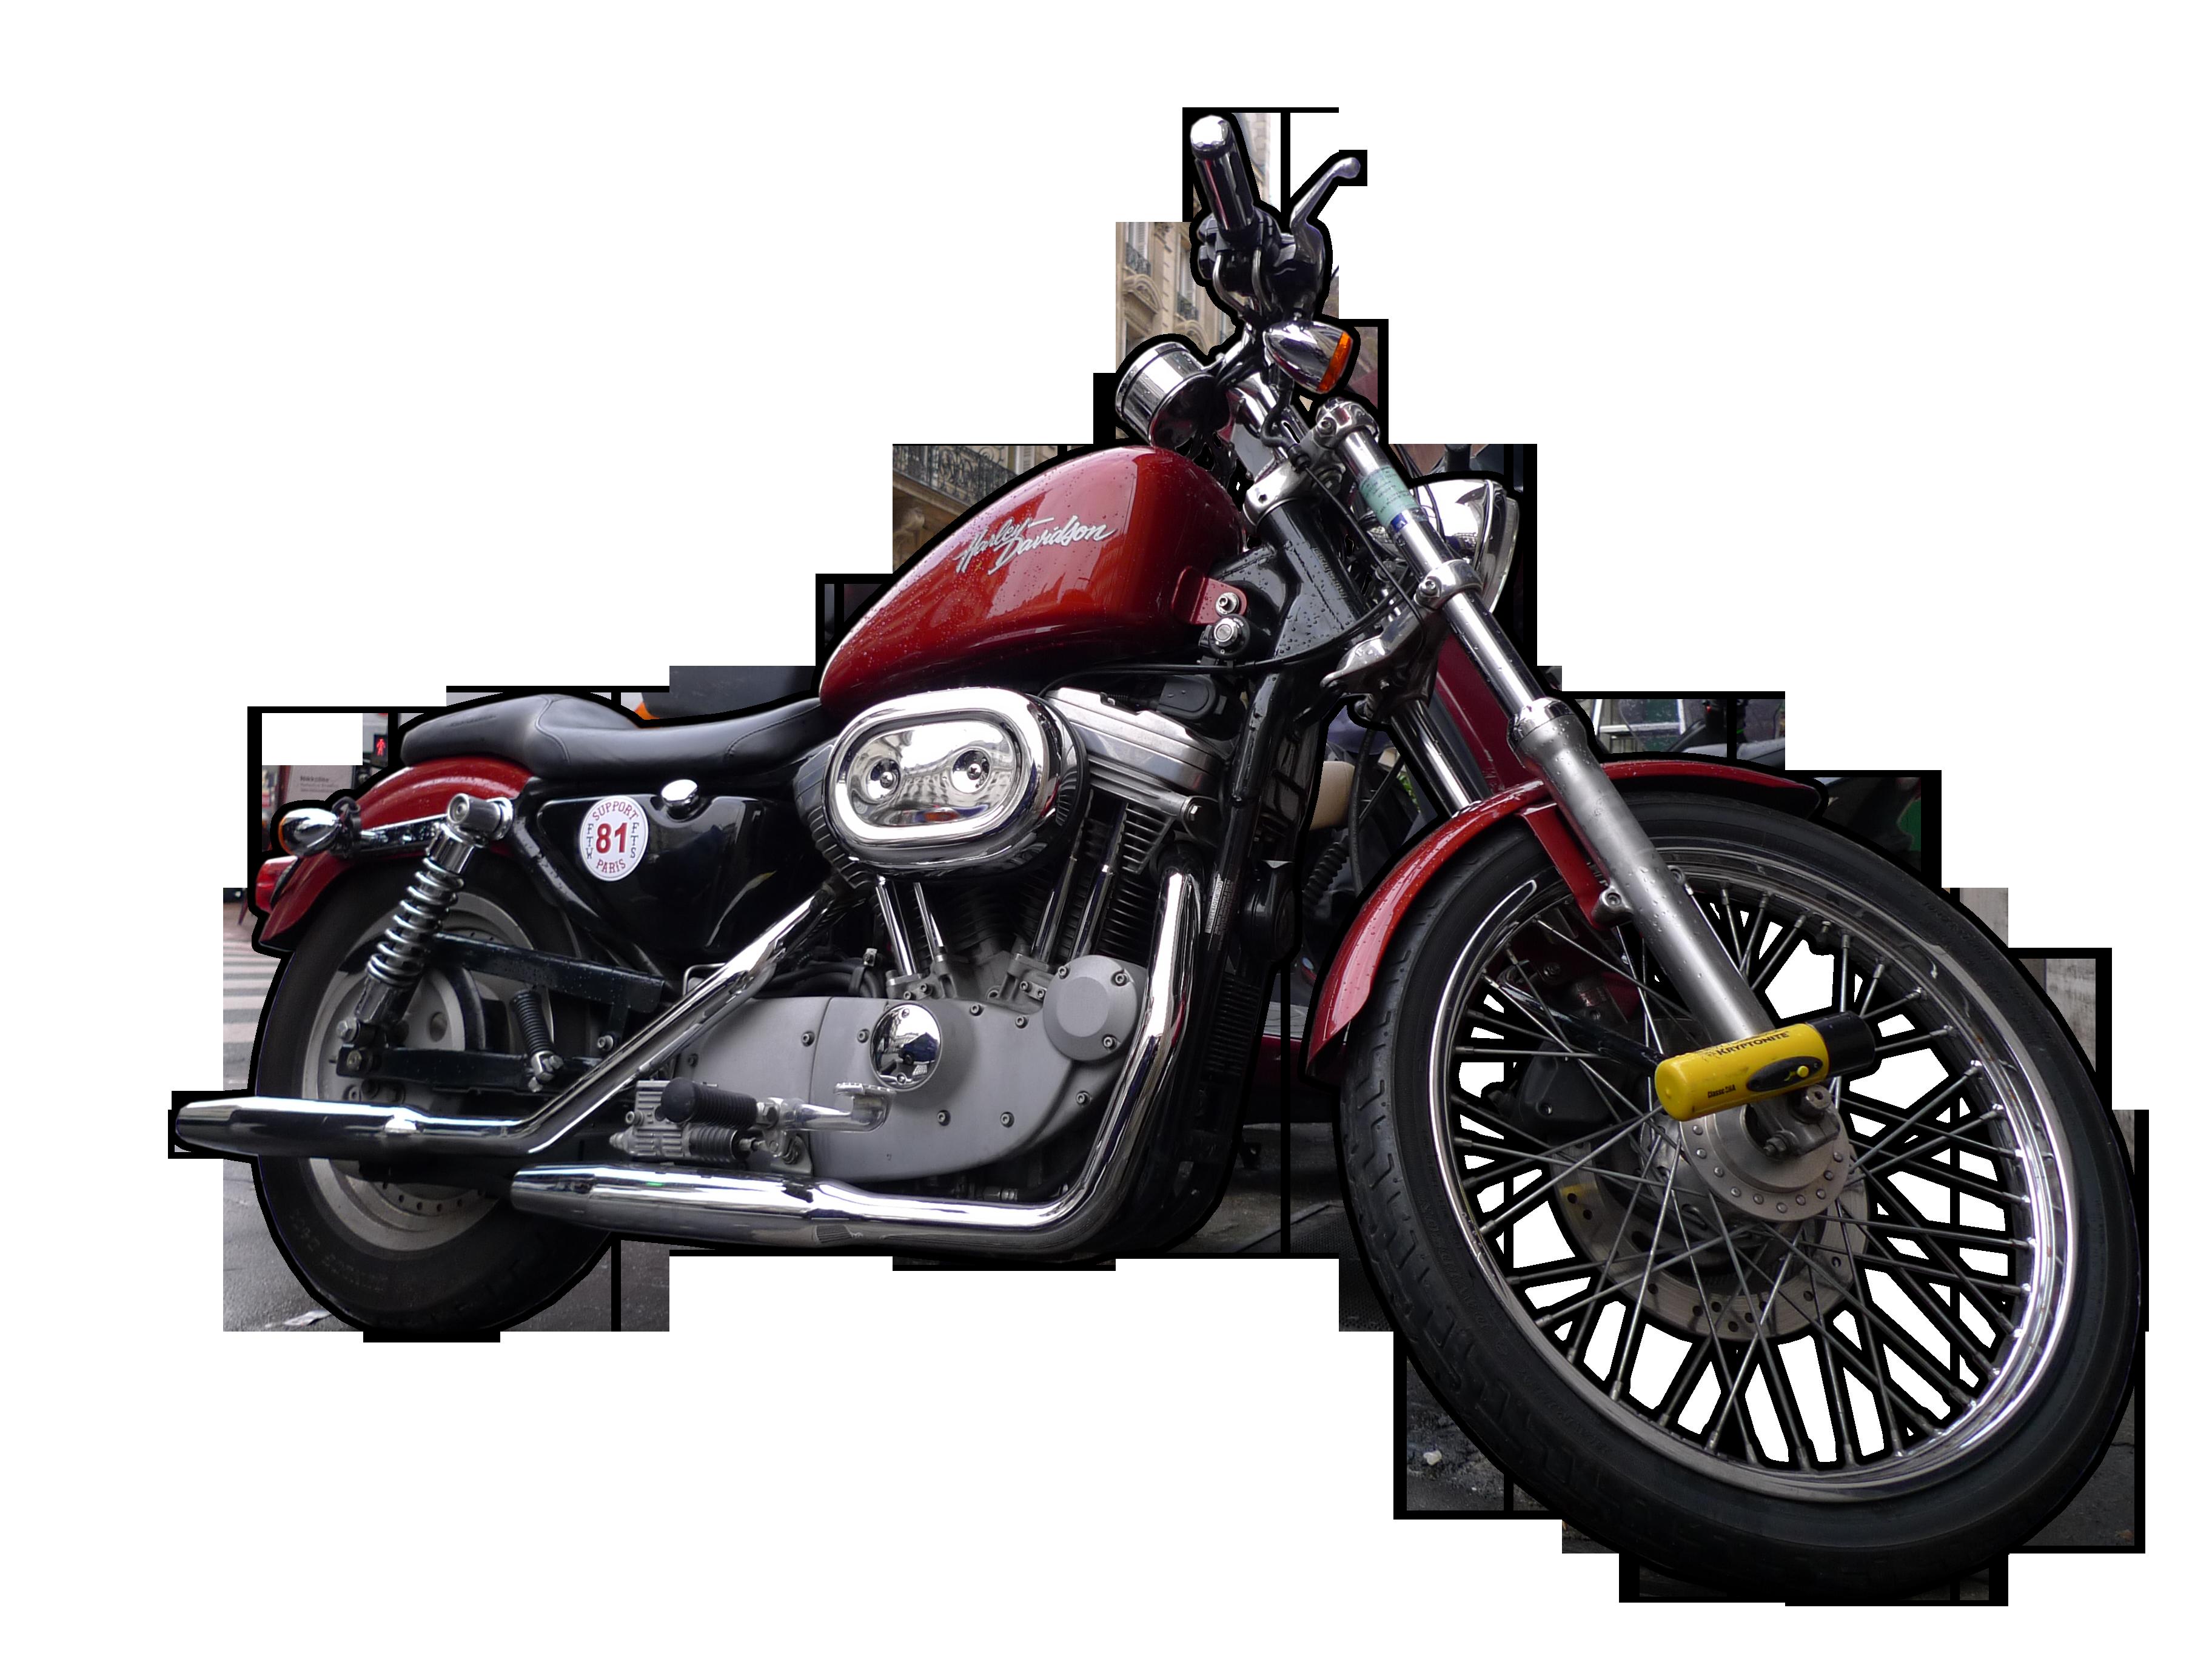 Harley davidson png image. Motorcycle clipart cruiser motorcycle